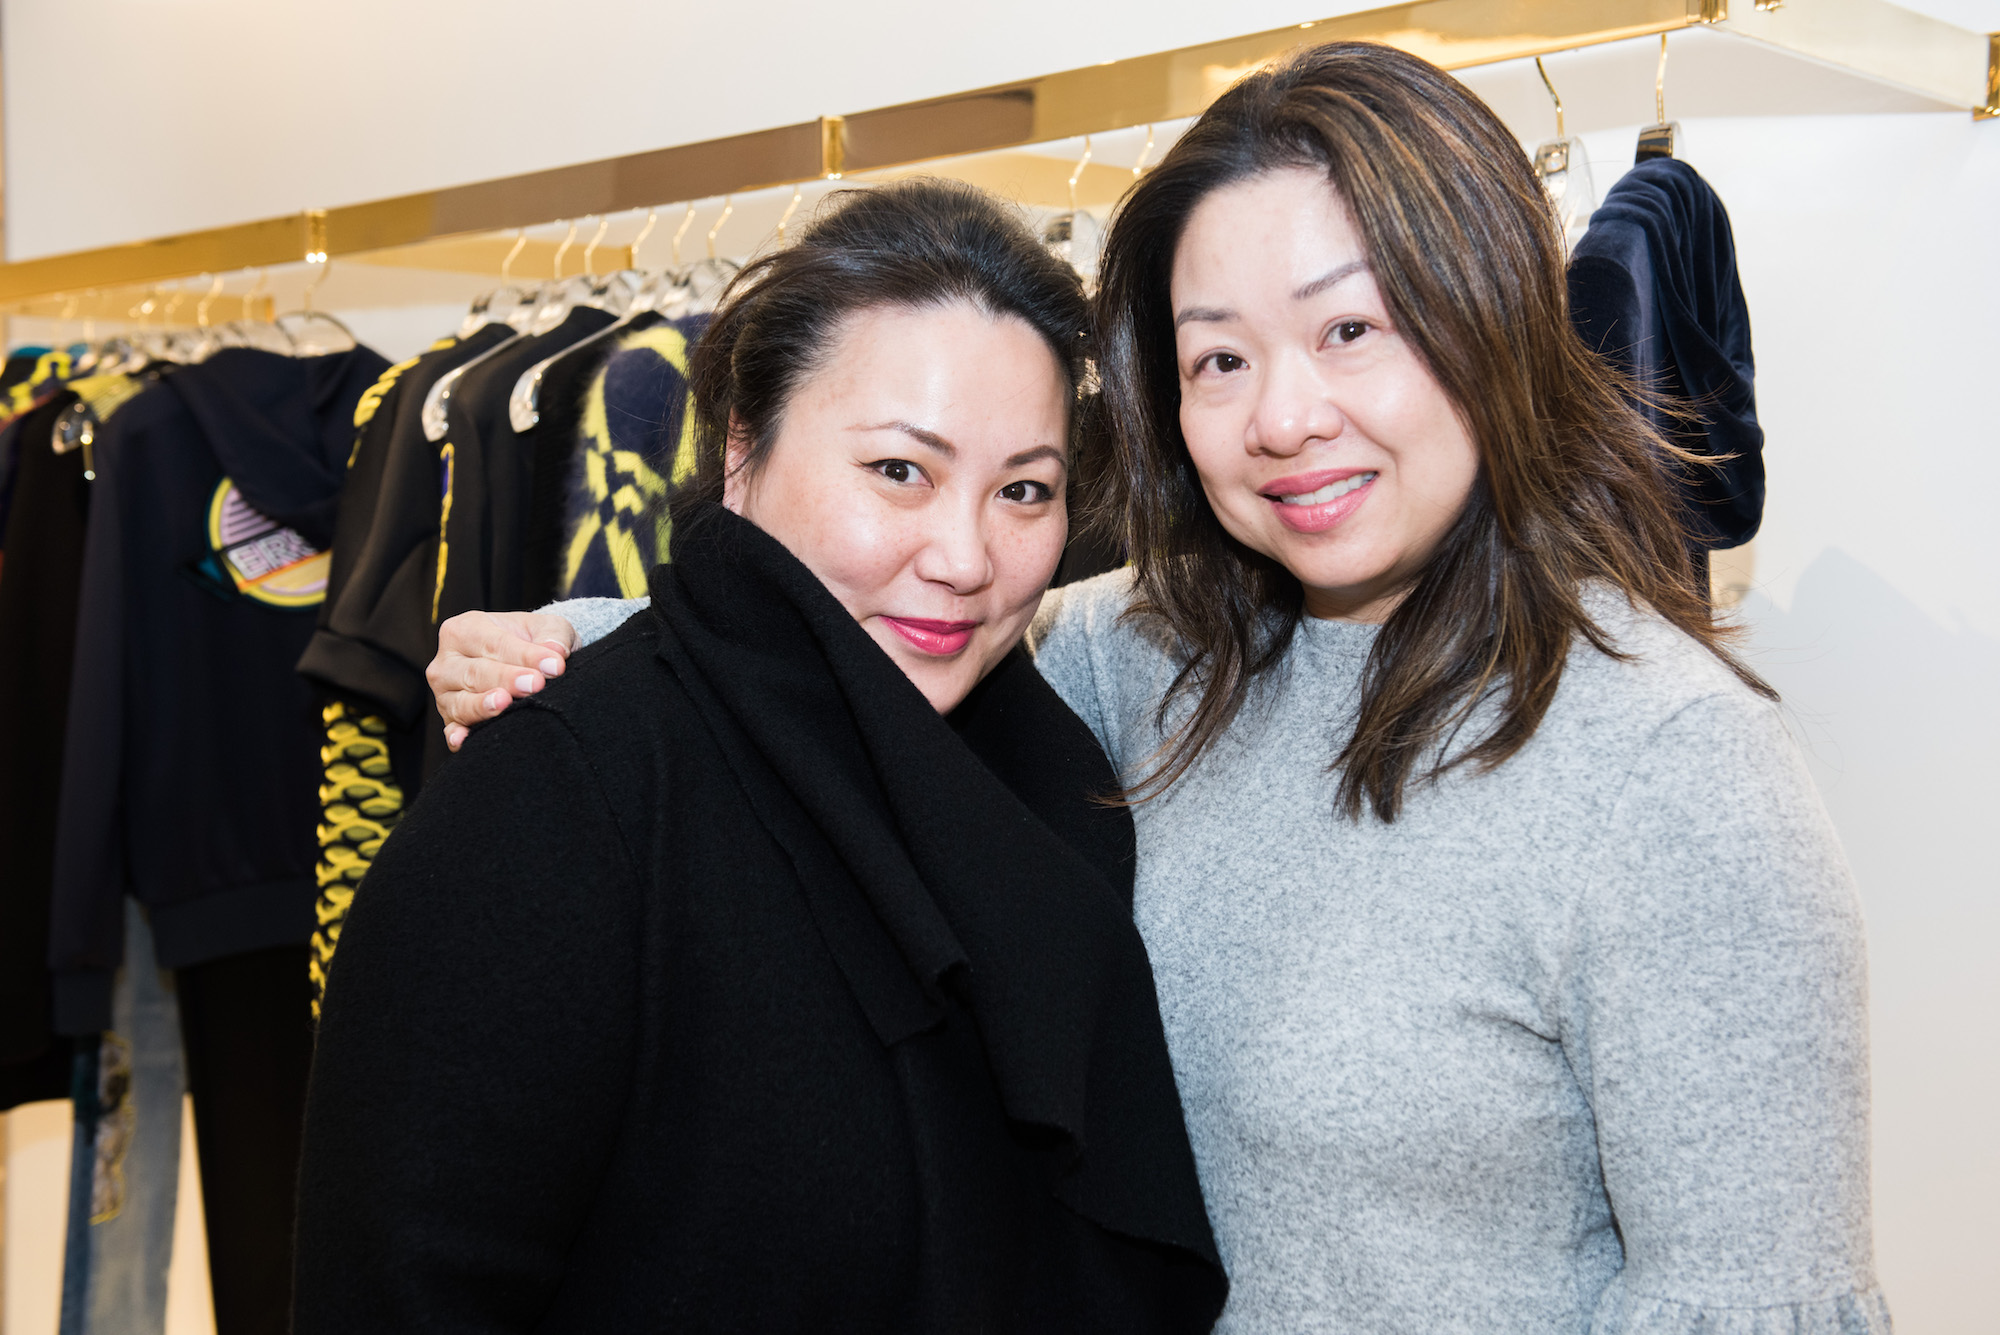 Charmaine Li, Candice Suen-Sieber